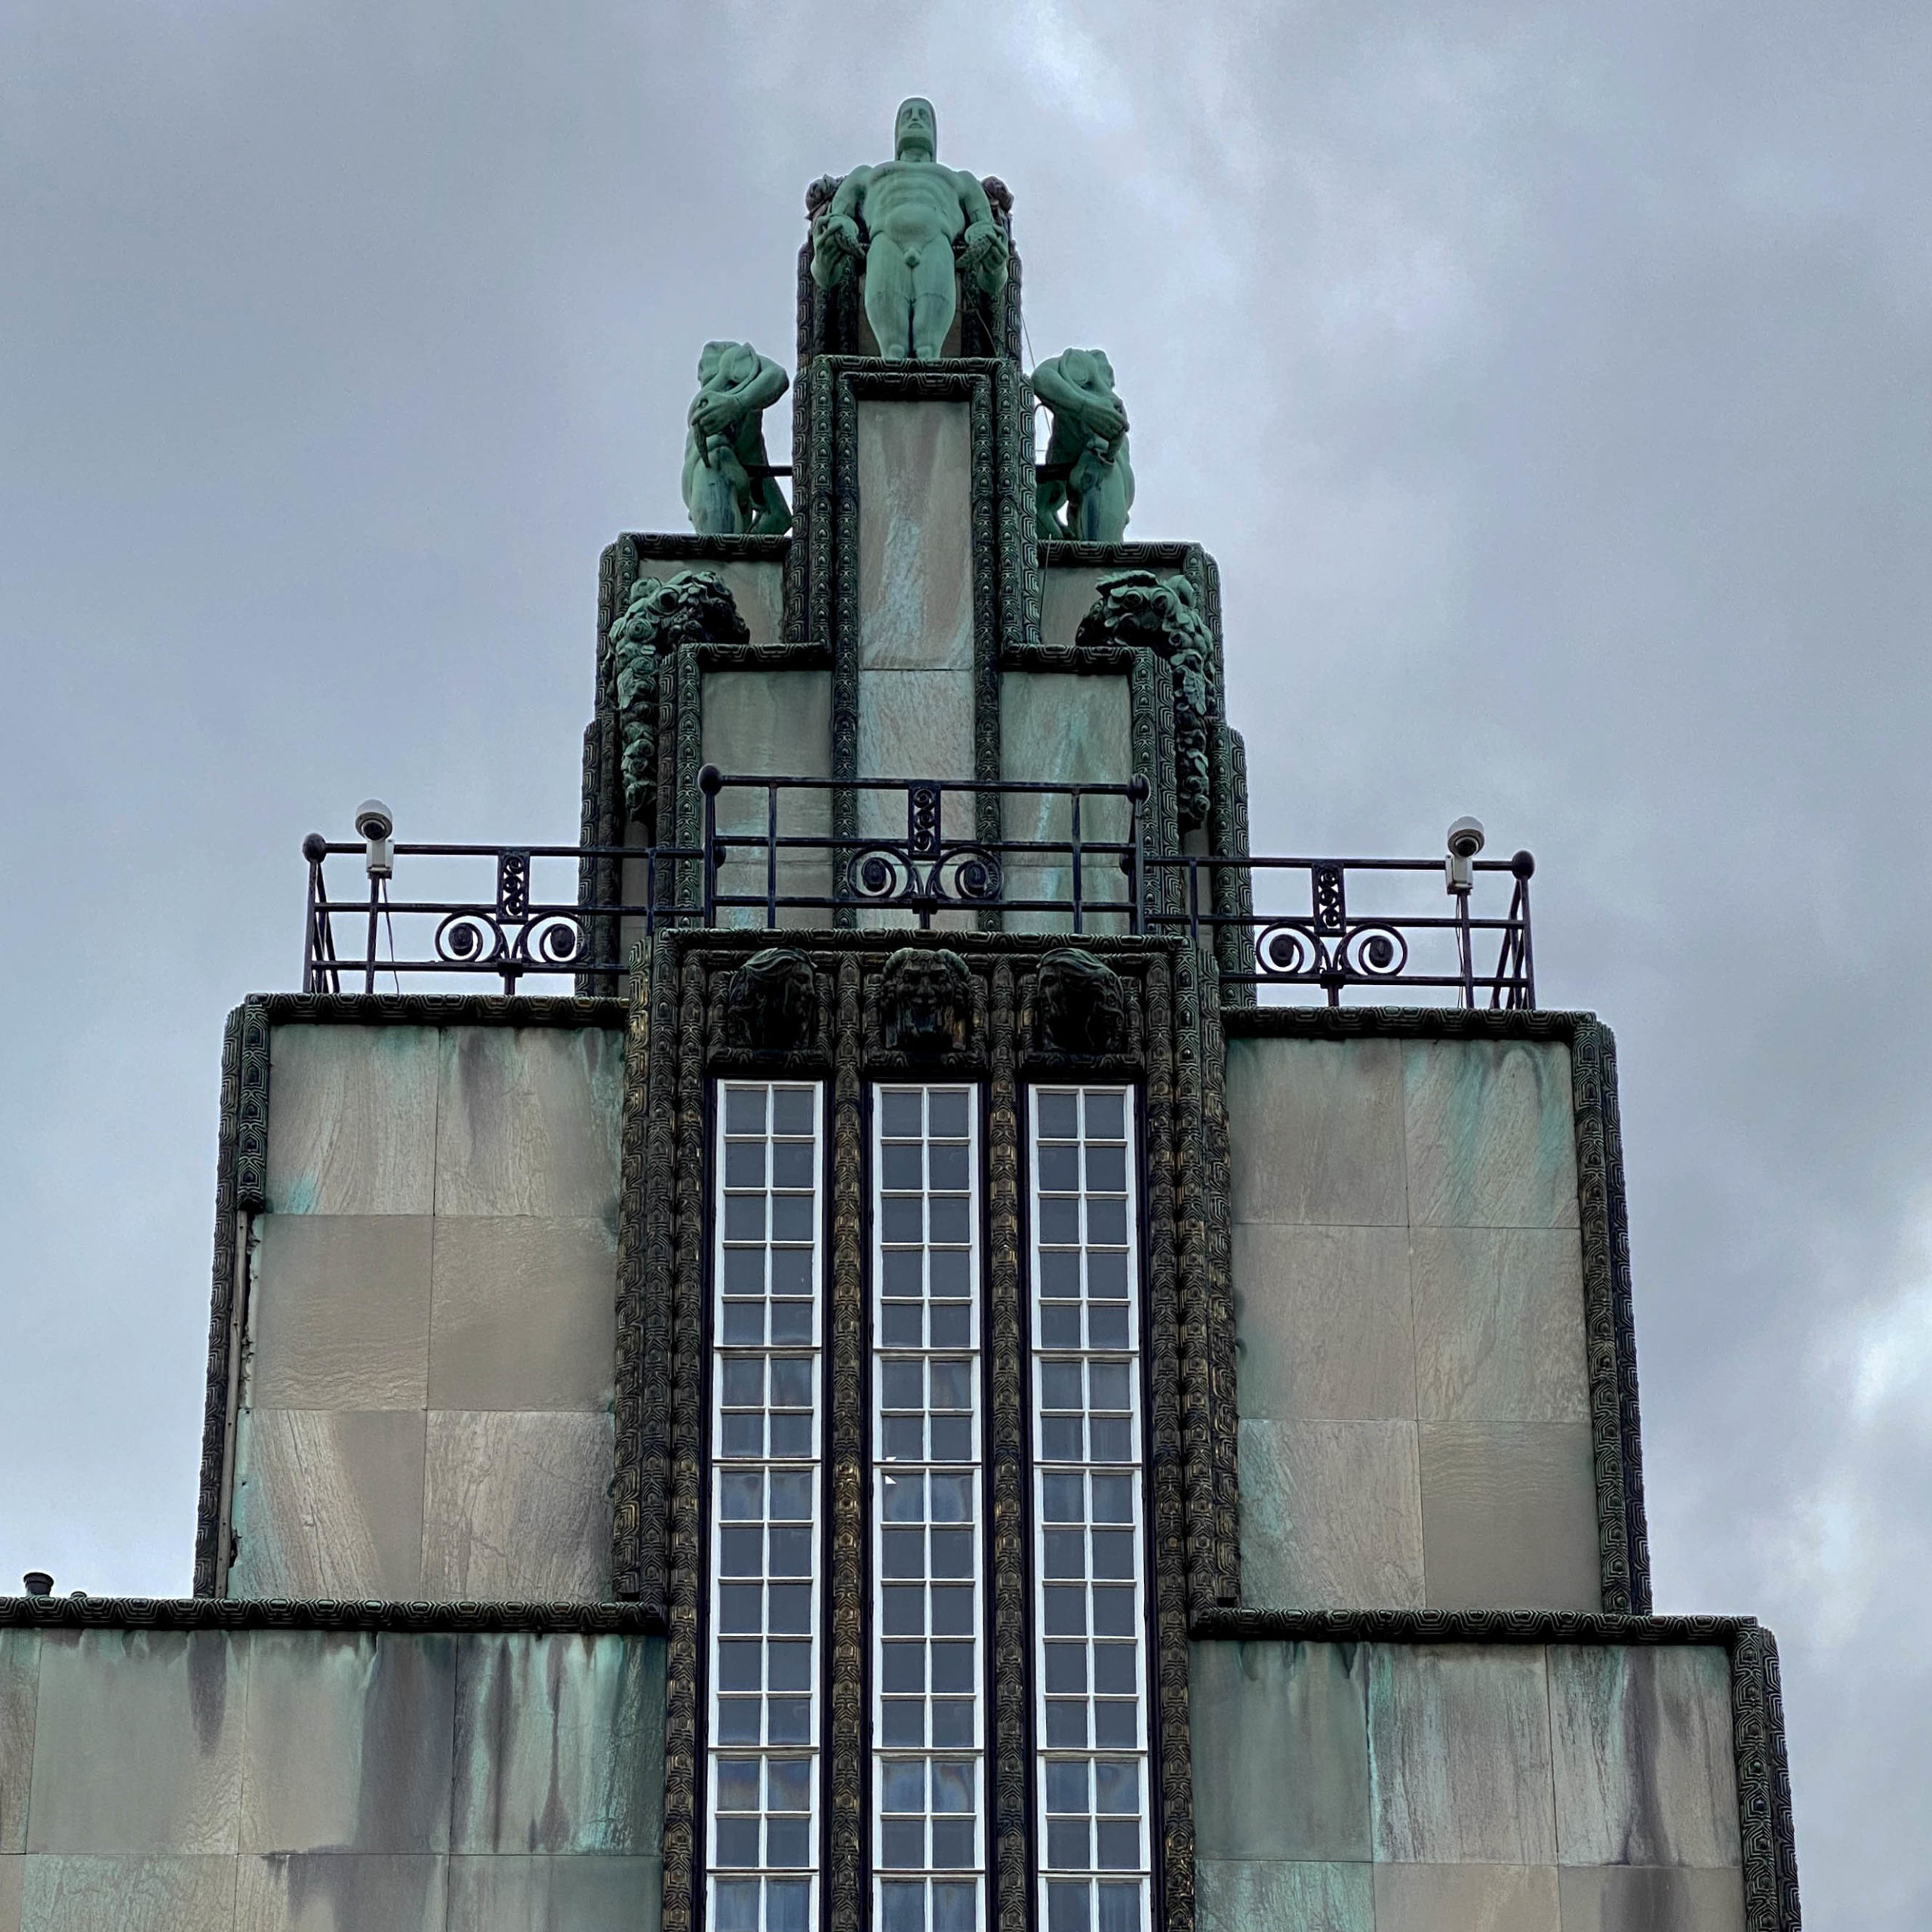 Palais Stoclet, 1905-1911. Architect: Josef Hoffmann